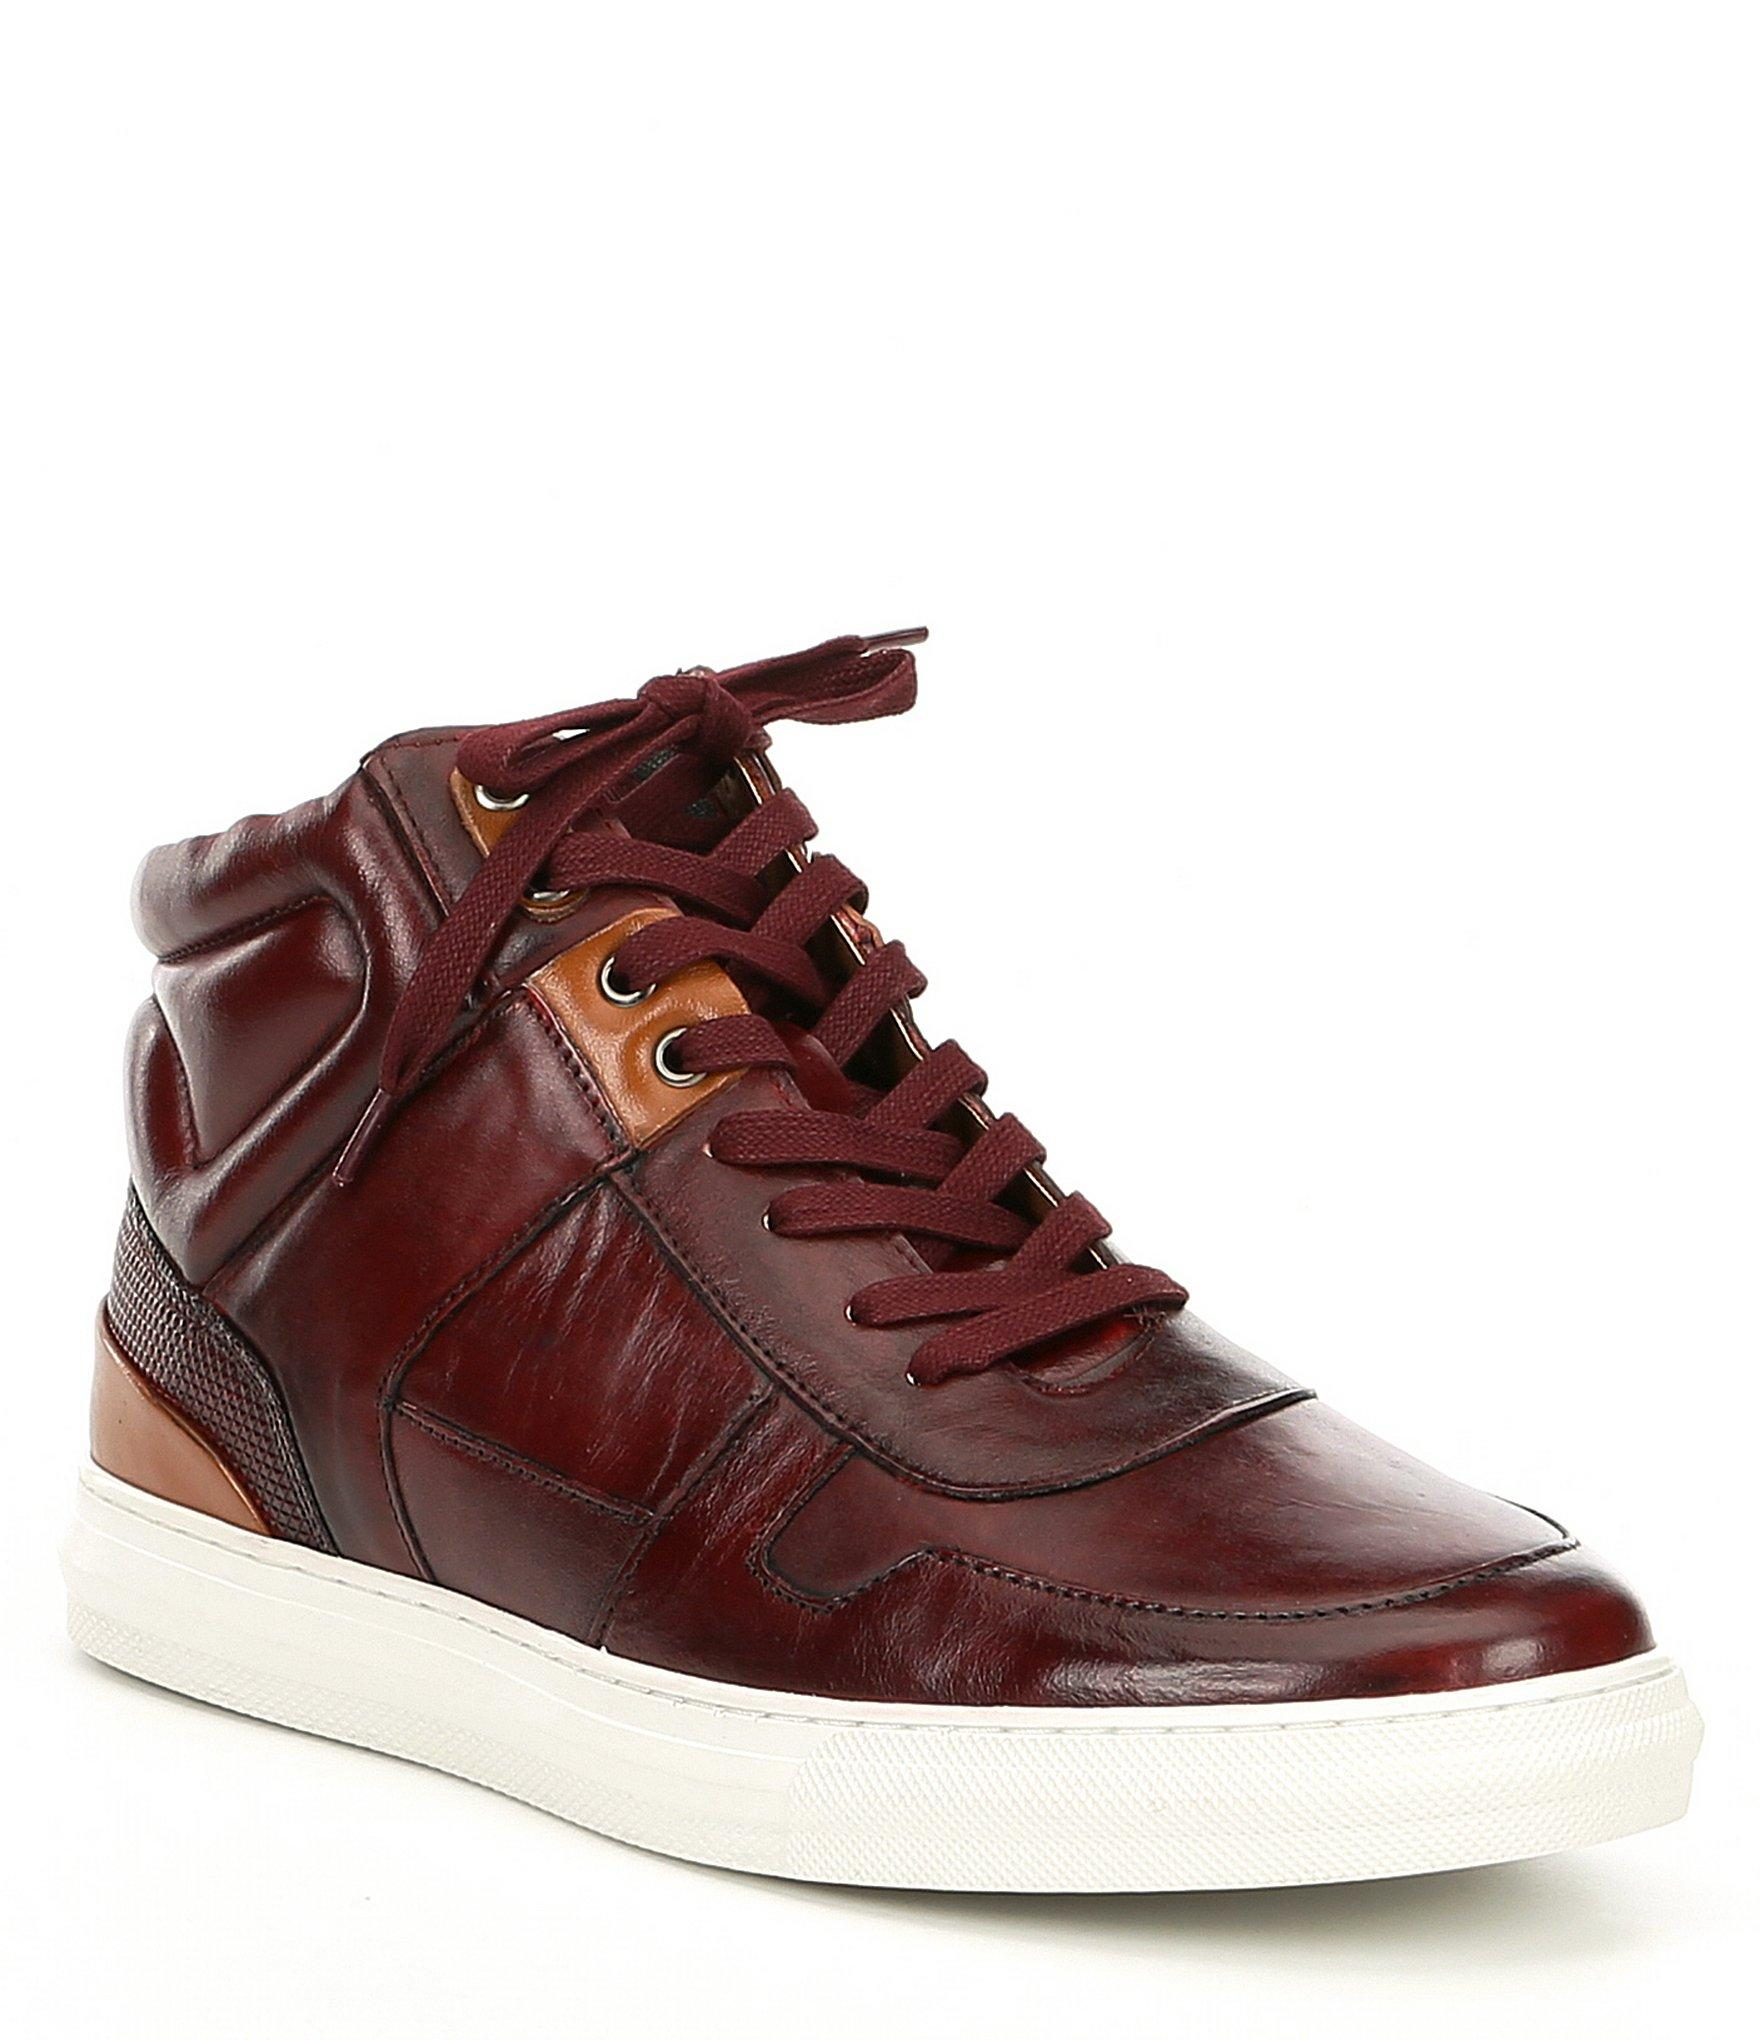 aec7ccbb93a9 Lyst - Steve Madden Mens Sharper Leather Hi-top Leather Sneaker in ...